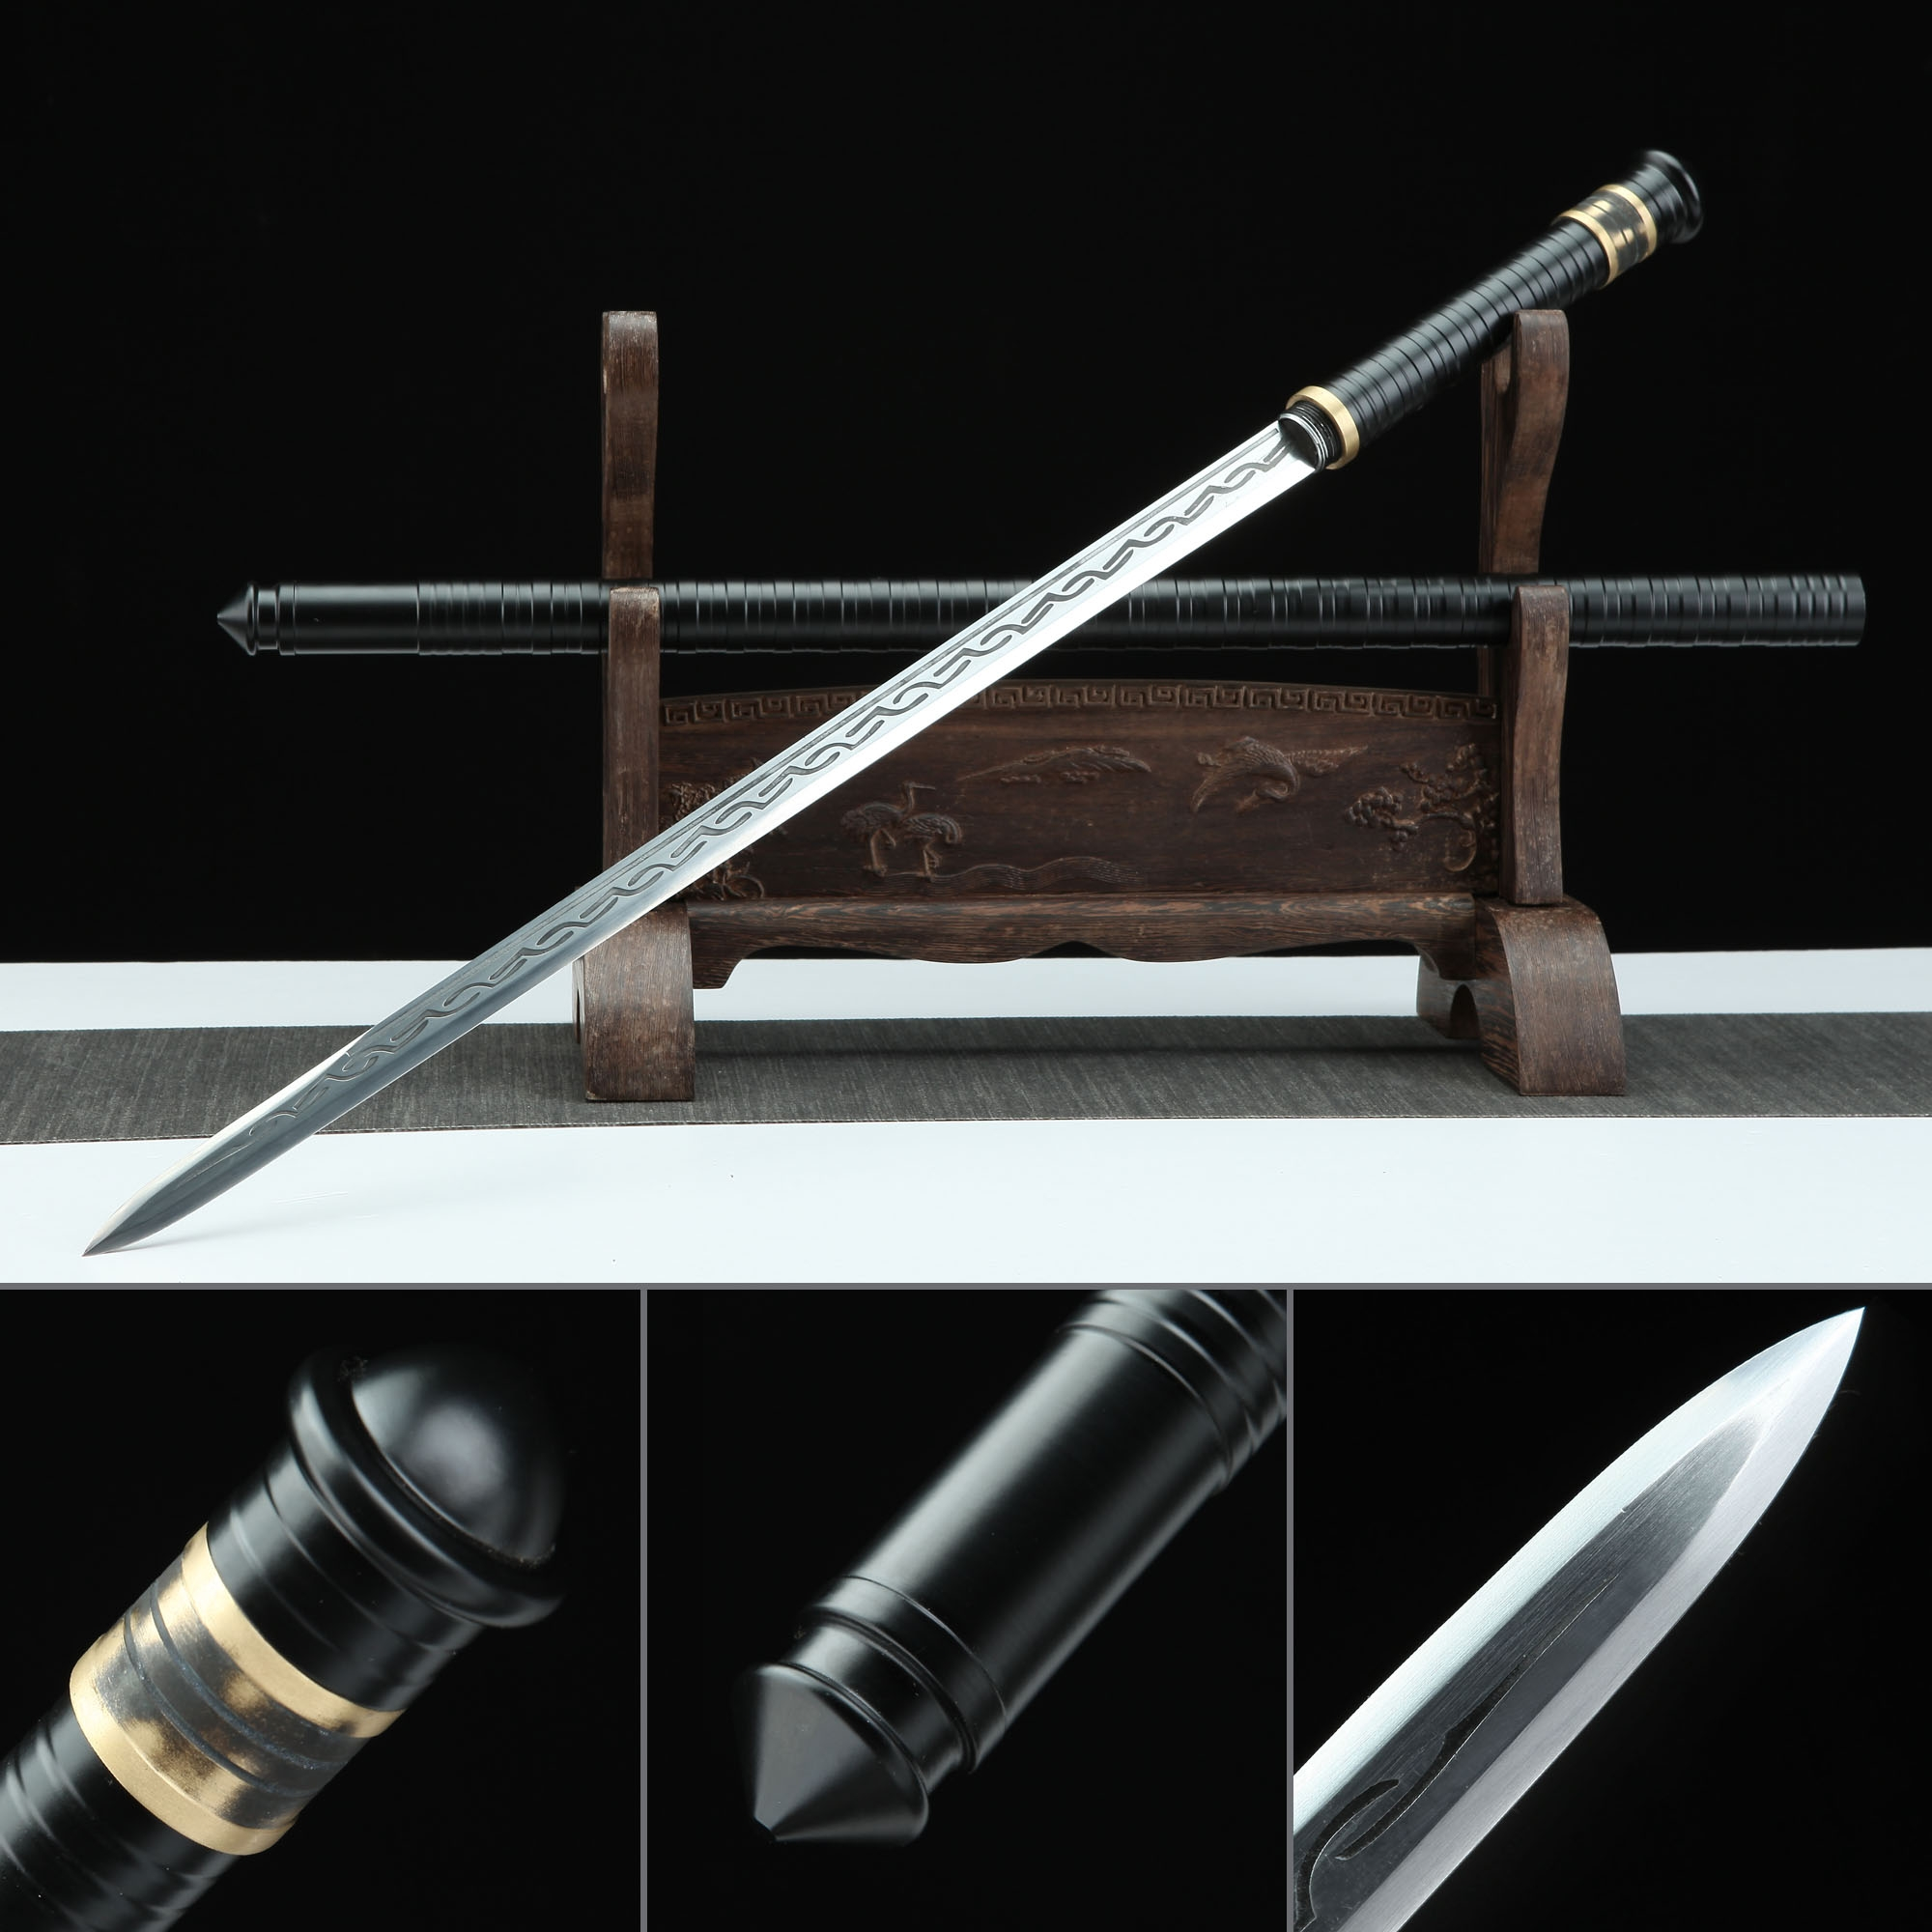 Handmade Spring Steel Black Fully Metal Spear No Guard Ninjato Ninja Swords Extend To 53 Inches